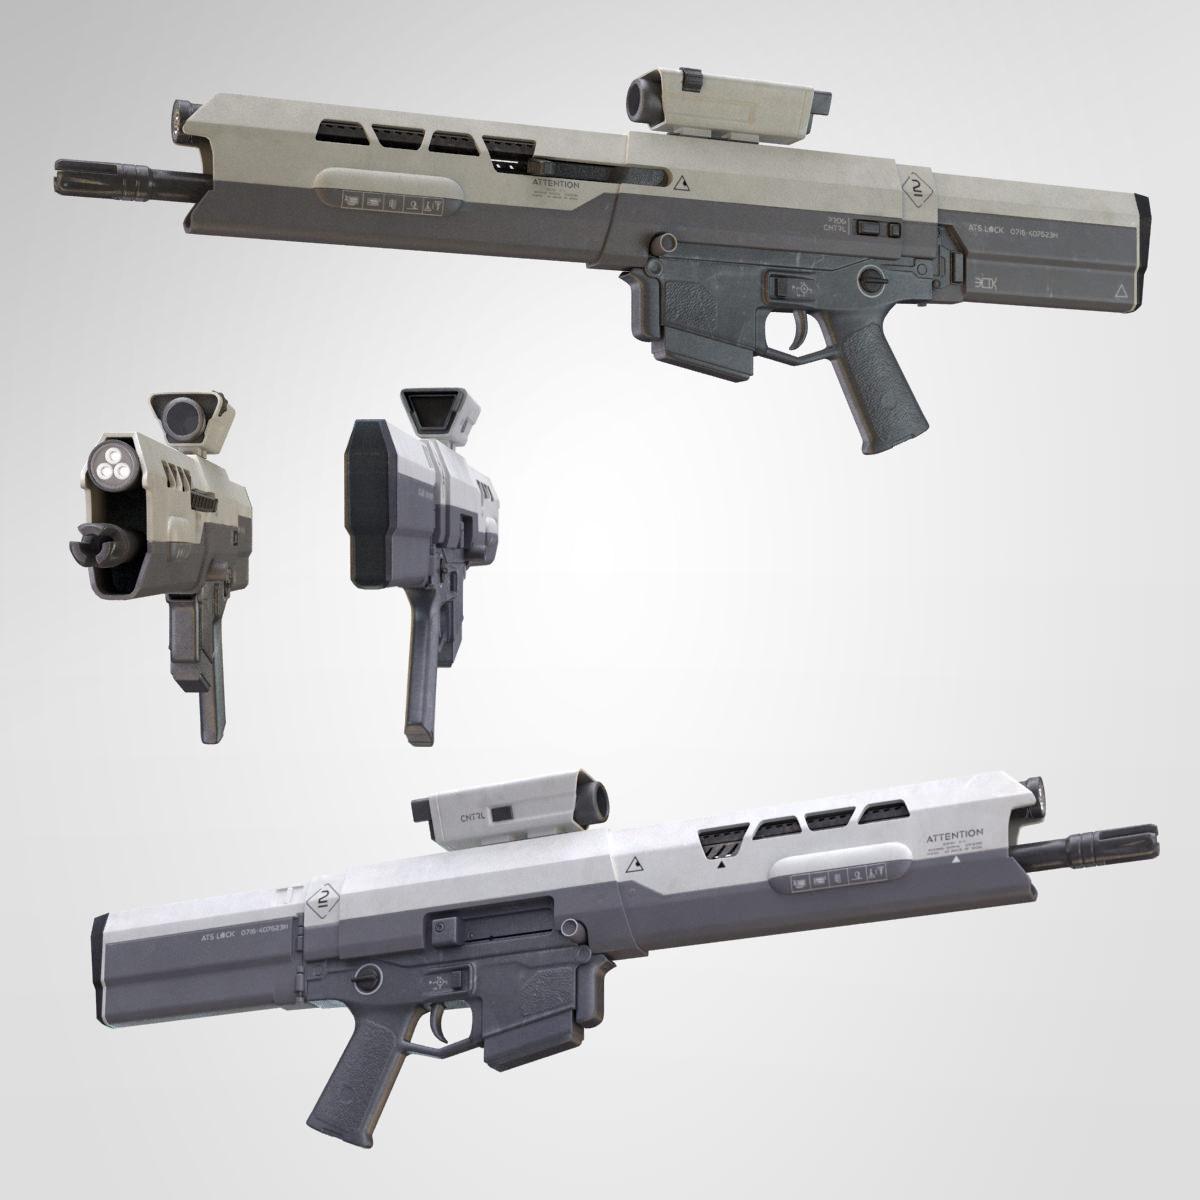 3d Gun Image 3d Home Architect: Oblivion Rifle 3D Model MAX OBJ FBX MA MB